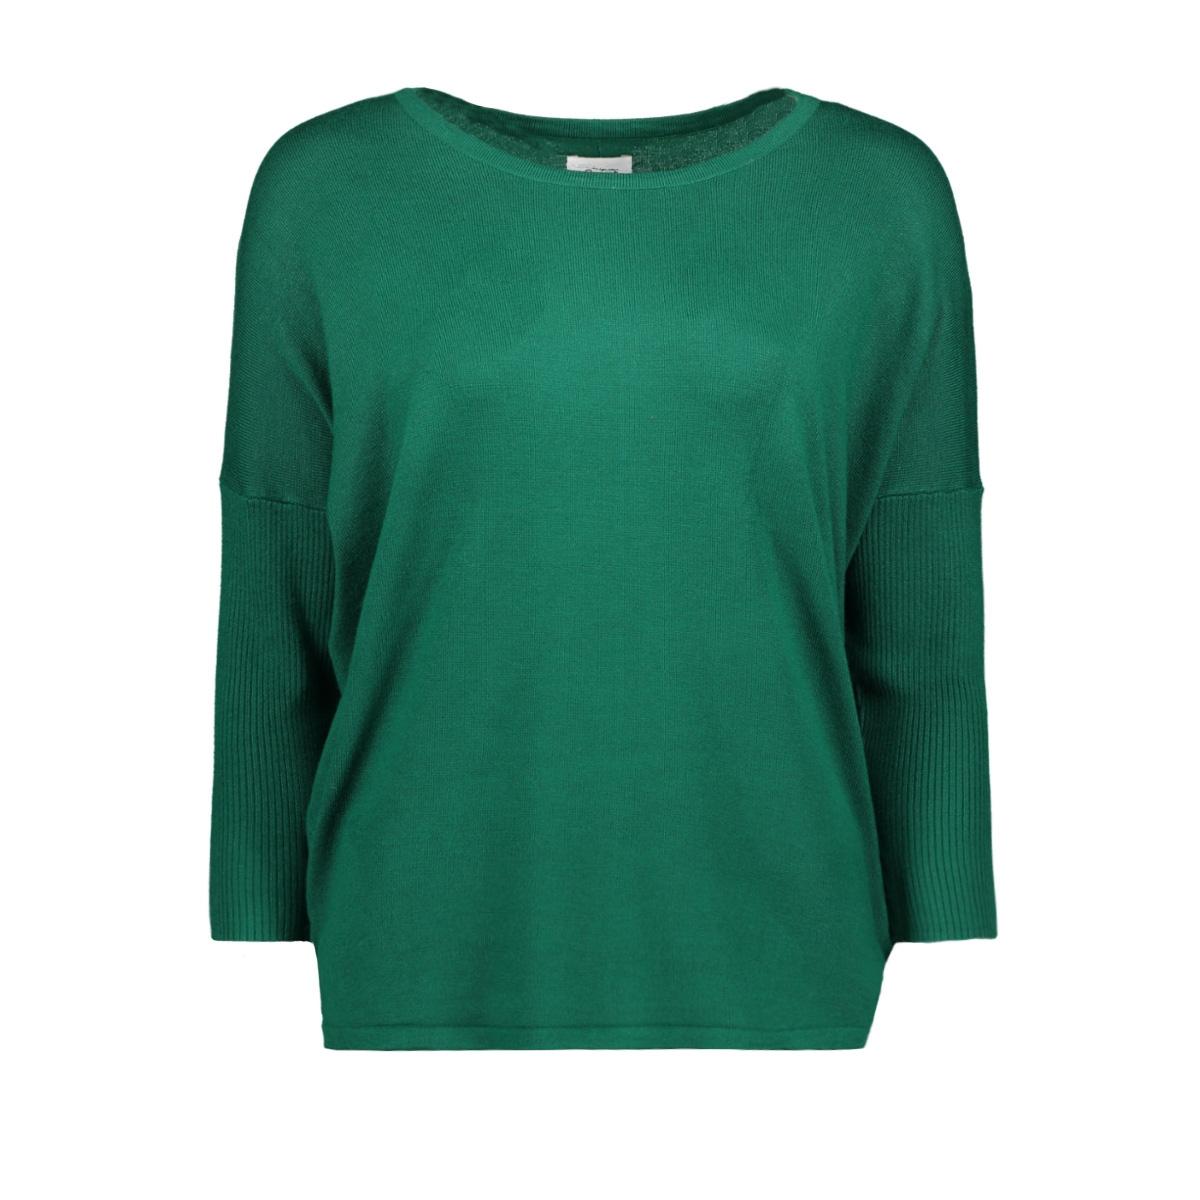 knit blouse a2561 saint tropez trui 8314